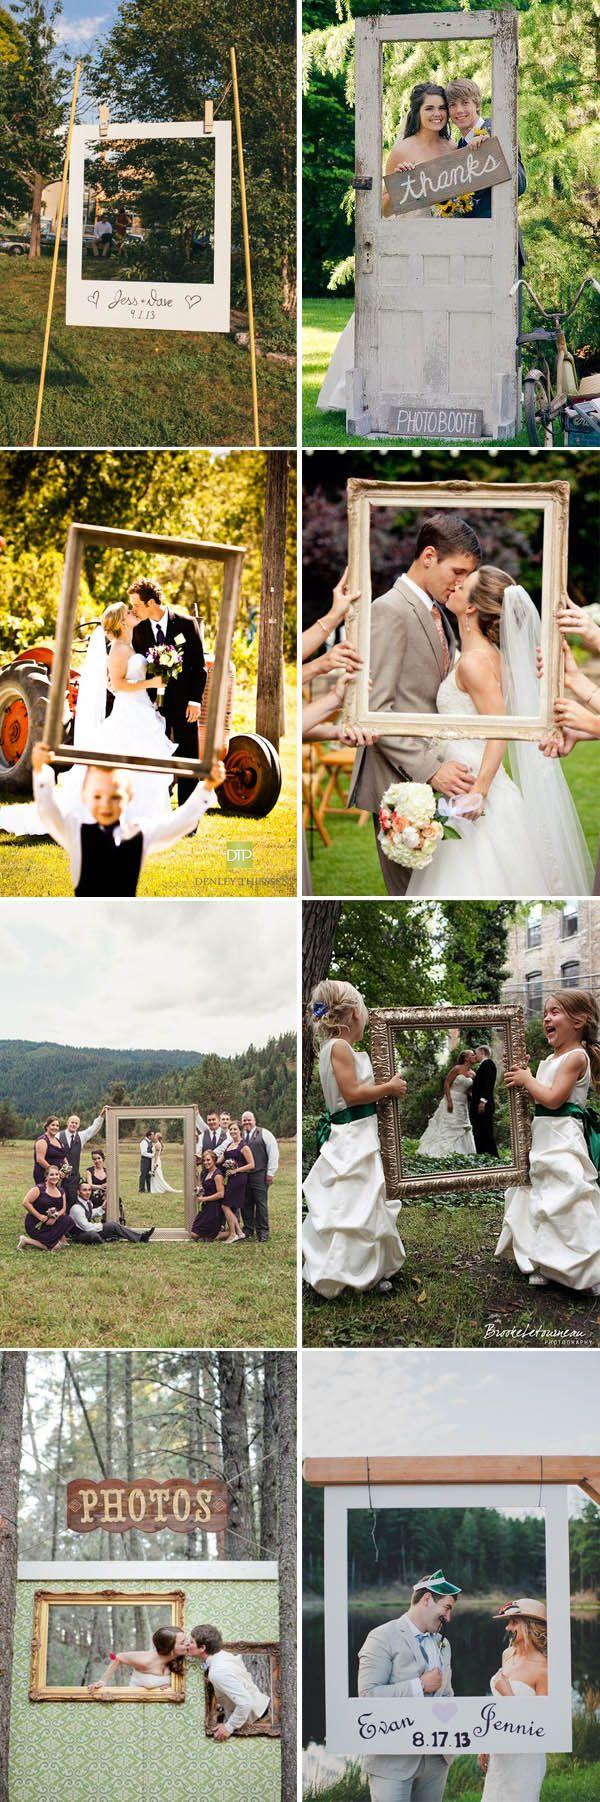 17 Best ideas about Wedding Photo Booths on Pinterest Photo